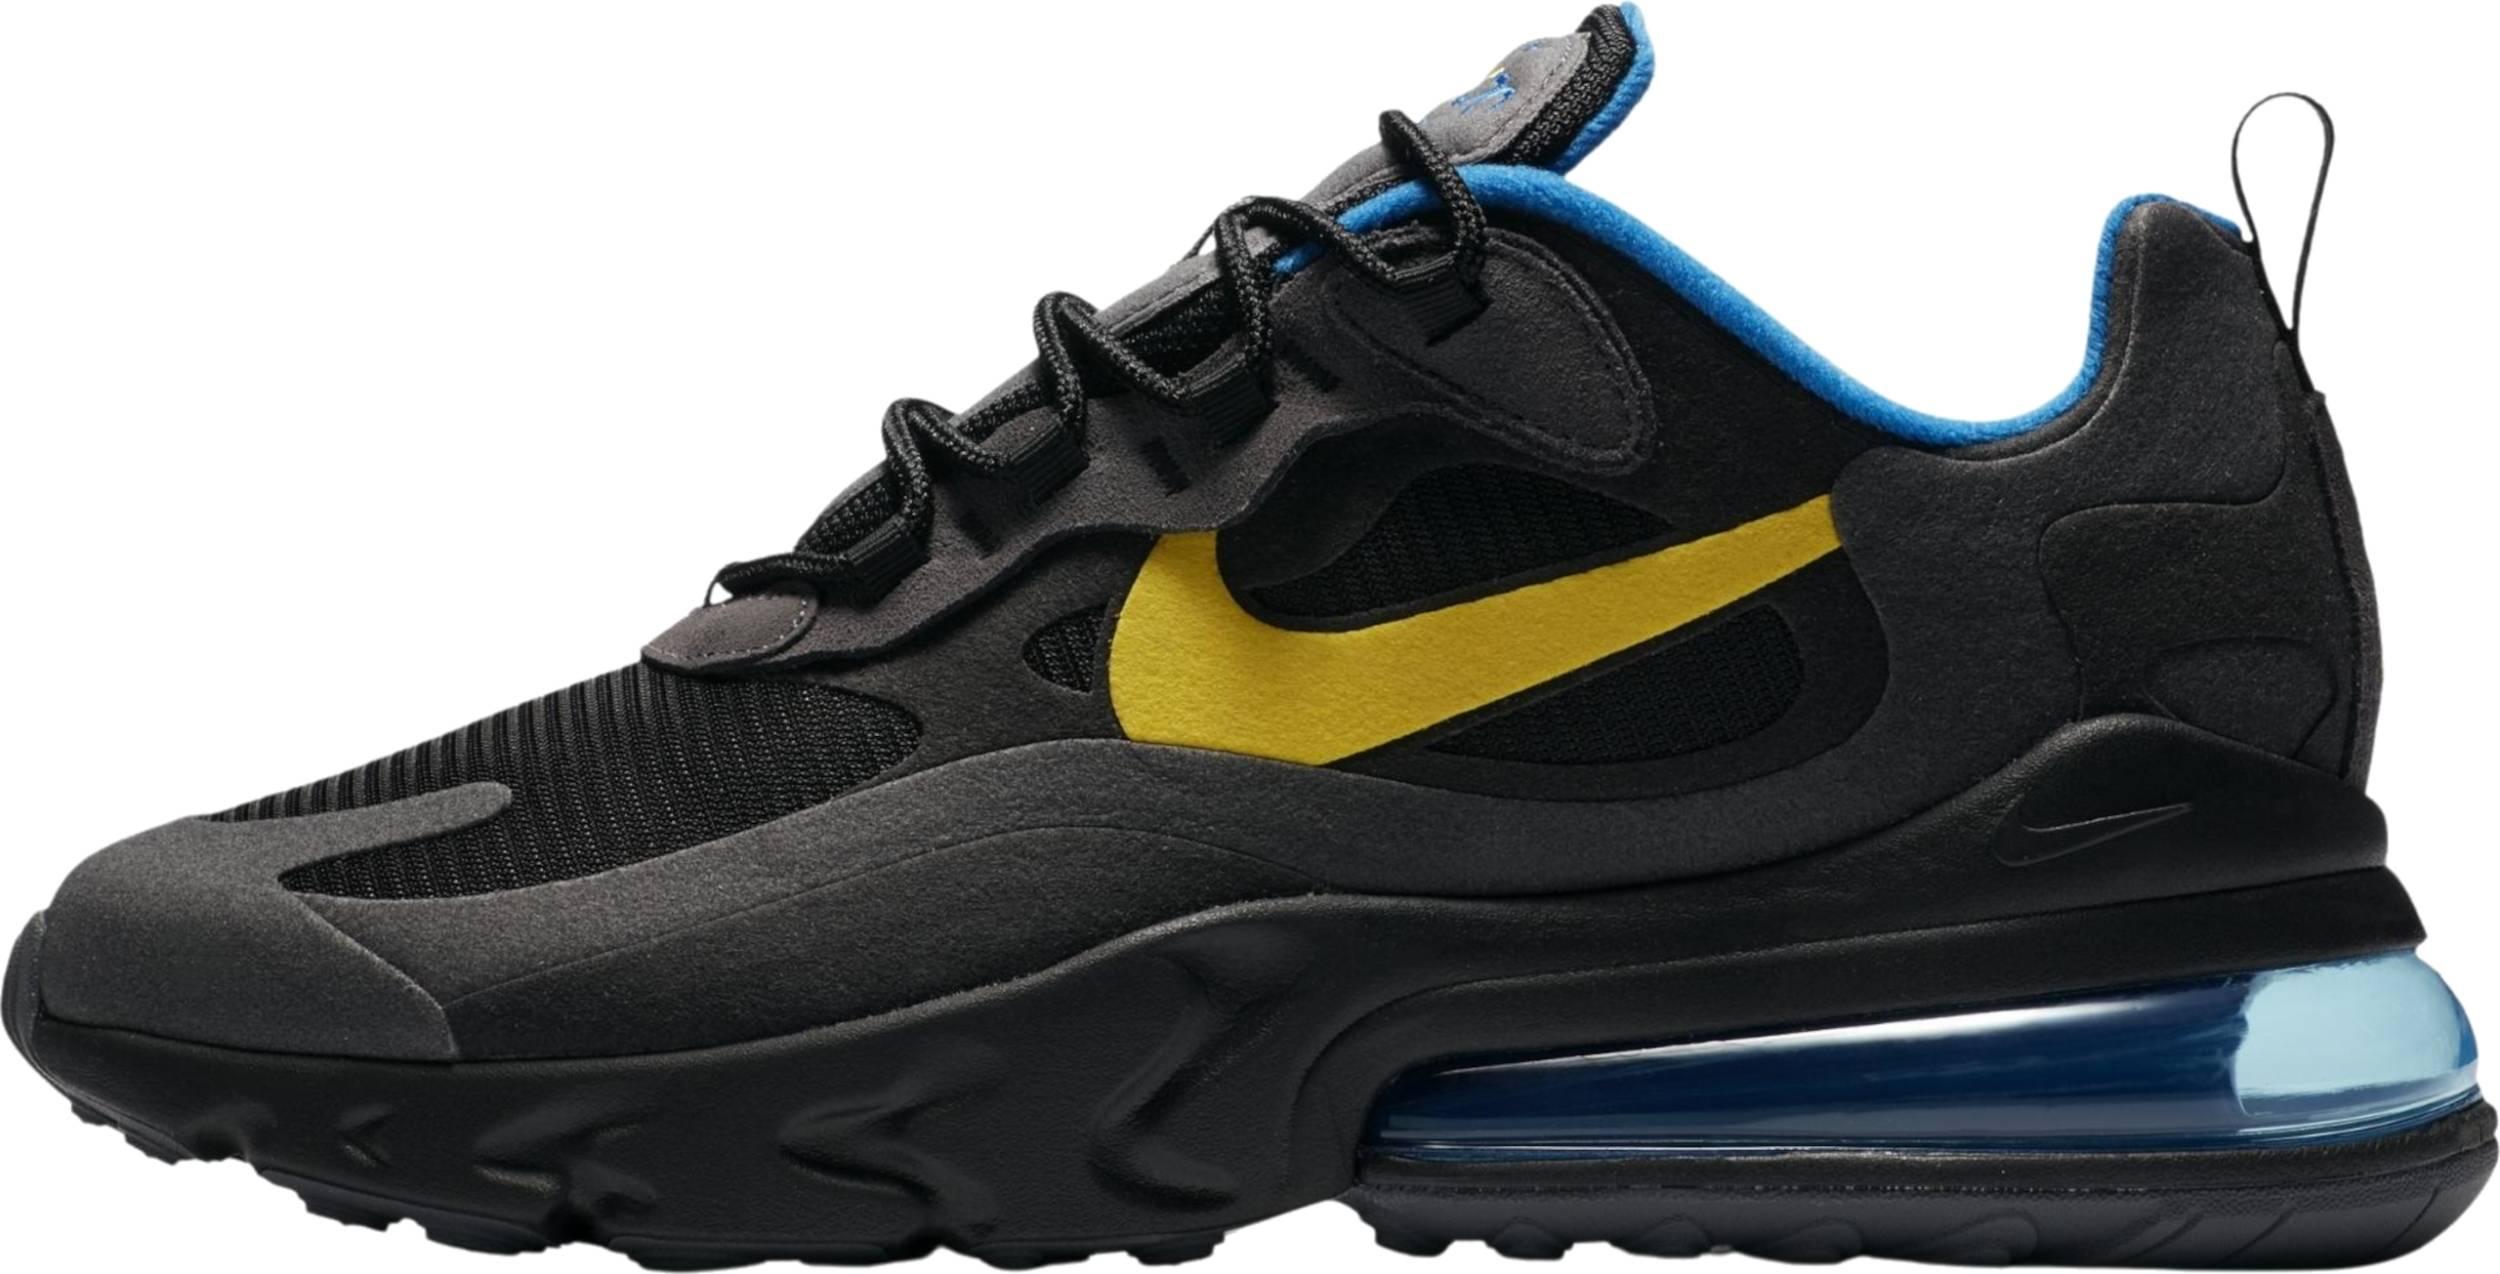 Nike Air Max 270 React sneakers in 20 colors (only $98)   RunRepeat